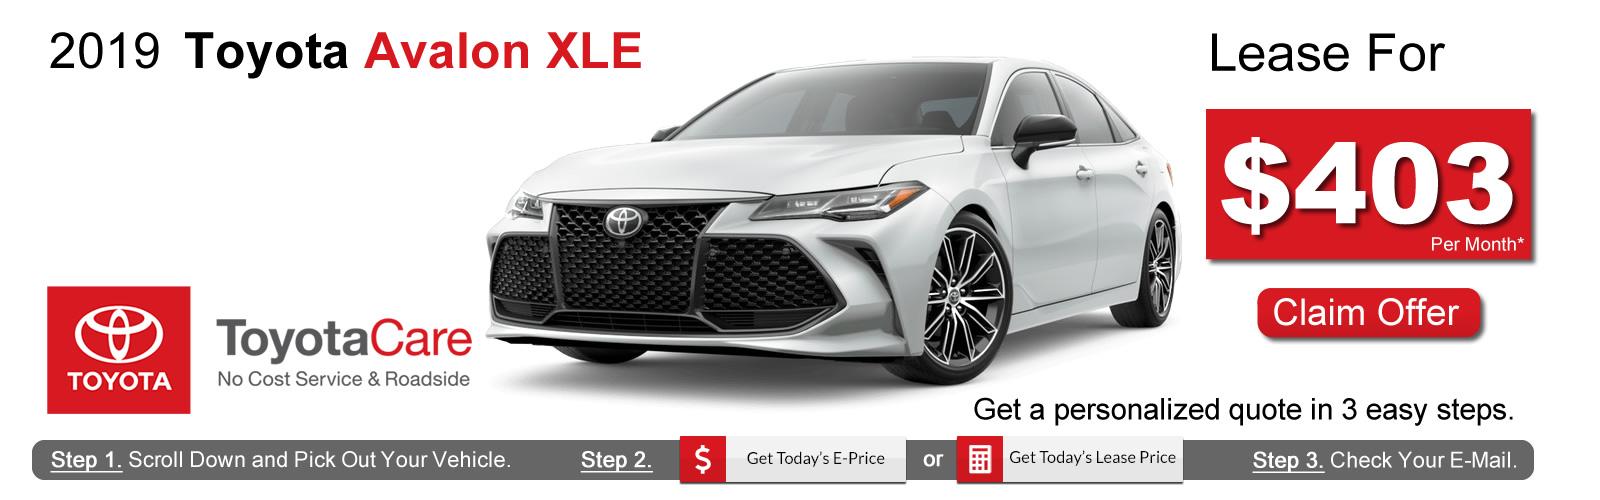 2019 Toyota Avalon Deals near Boston, MA